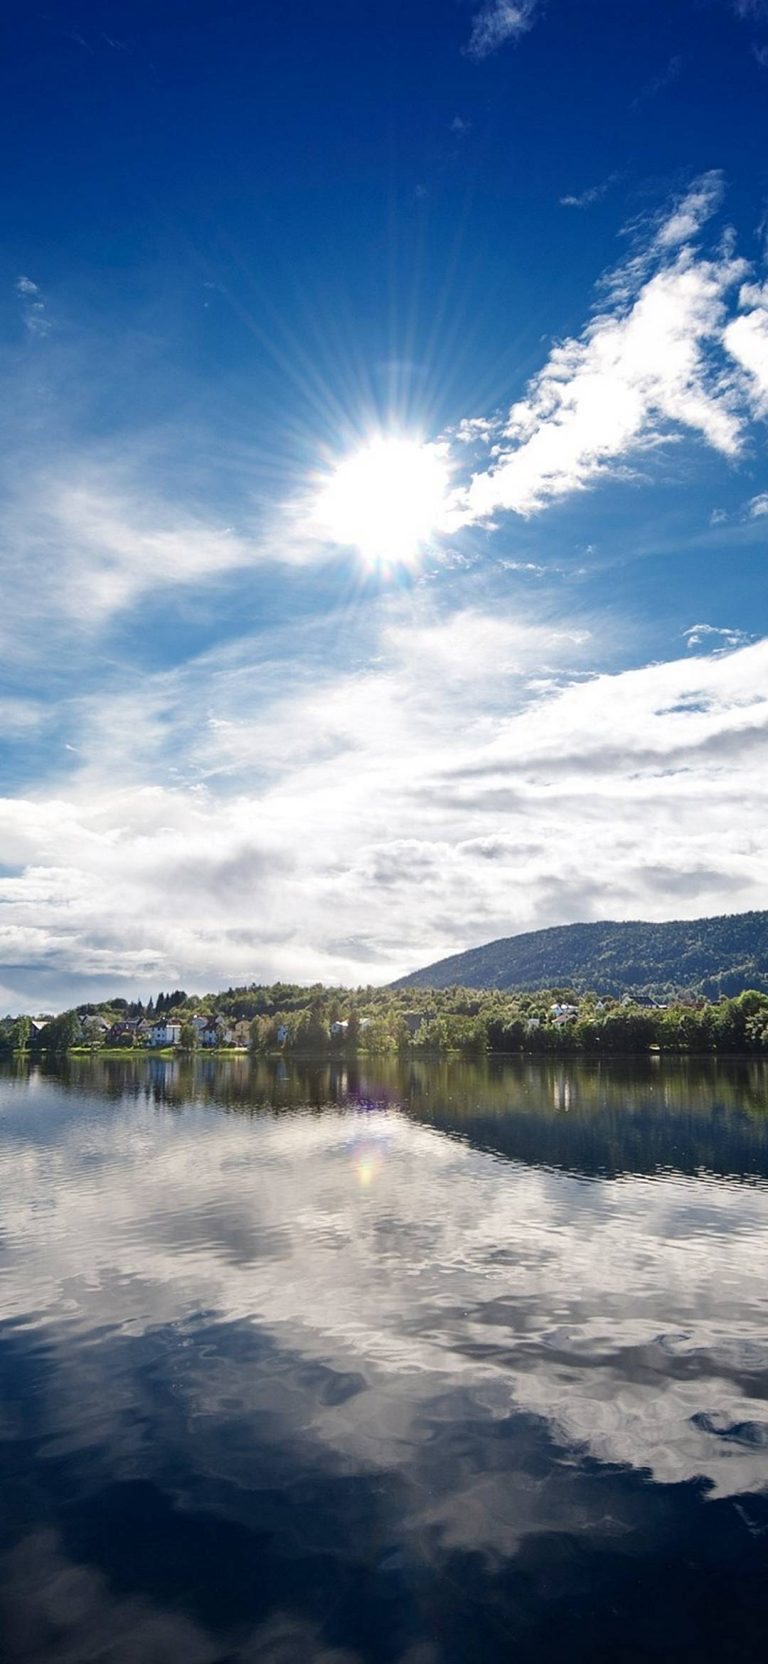 Sunny Lake 1080x2340 768x1664